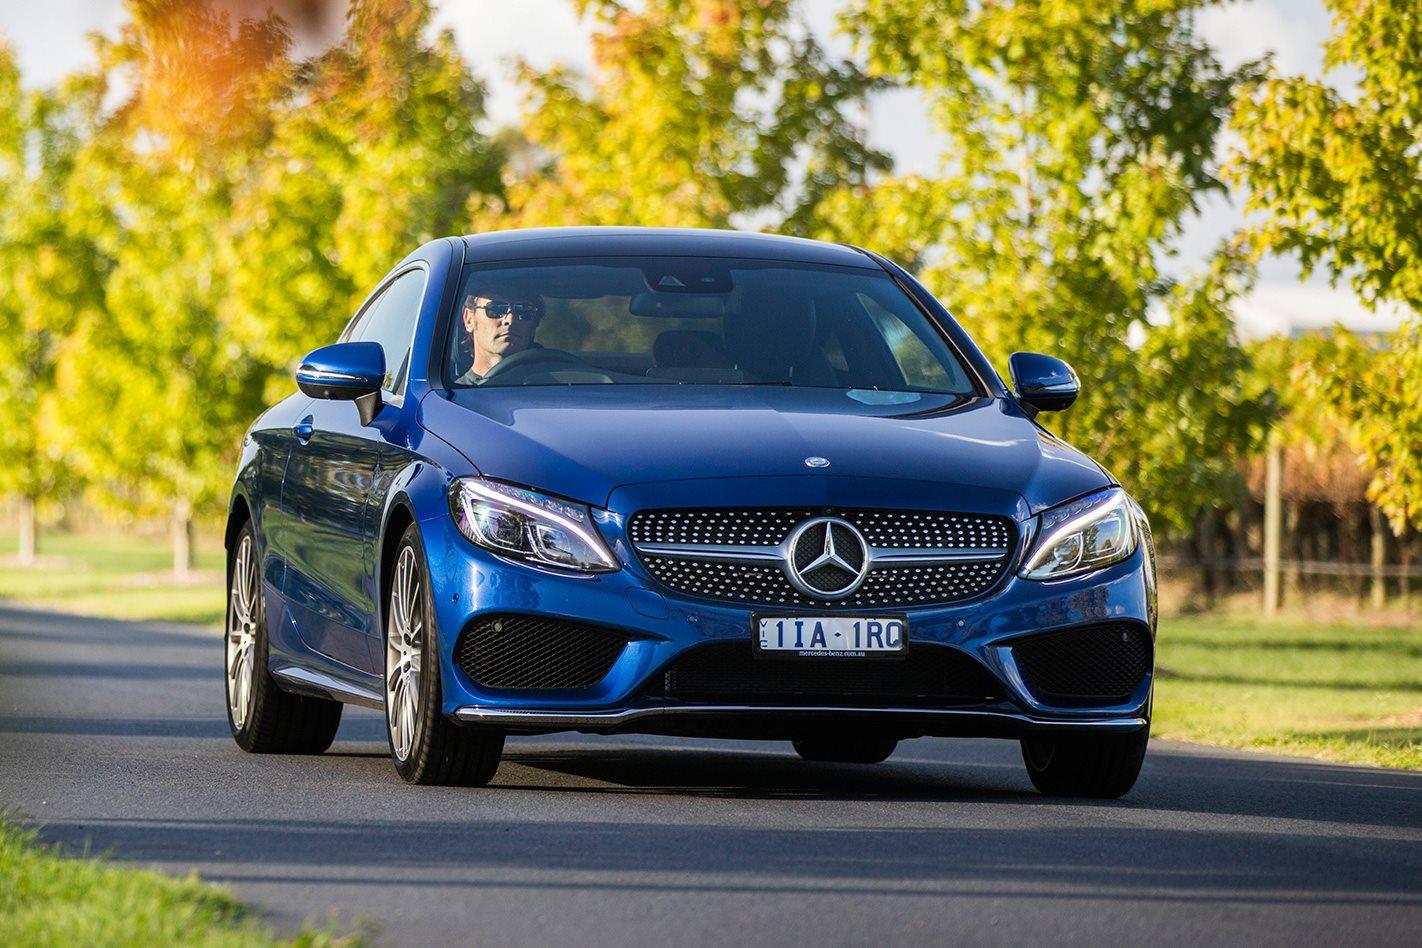 2016 Mercedes-Benz C200 Coupe Quick Review